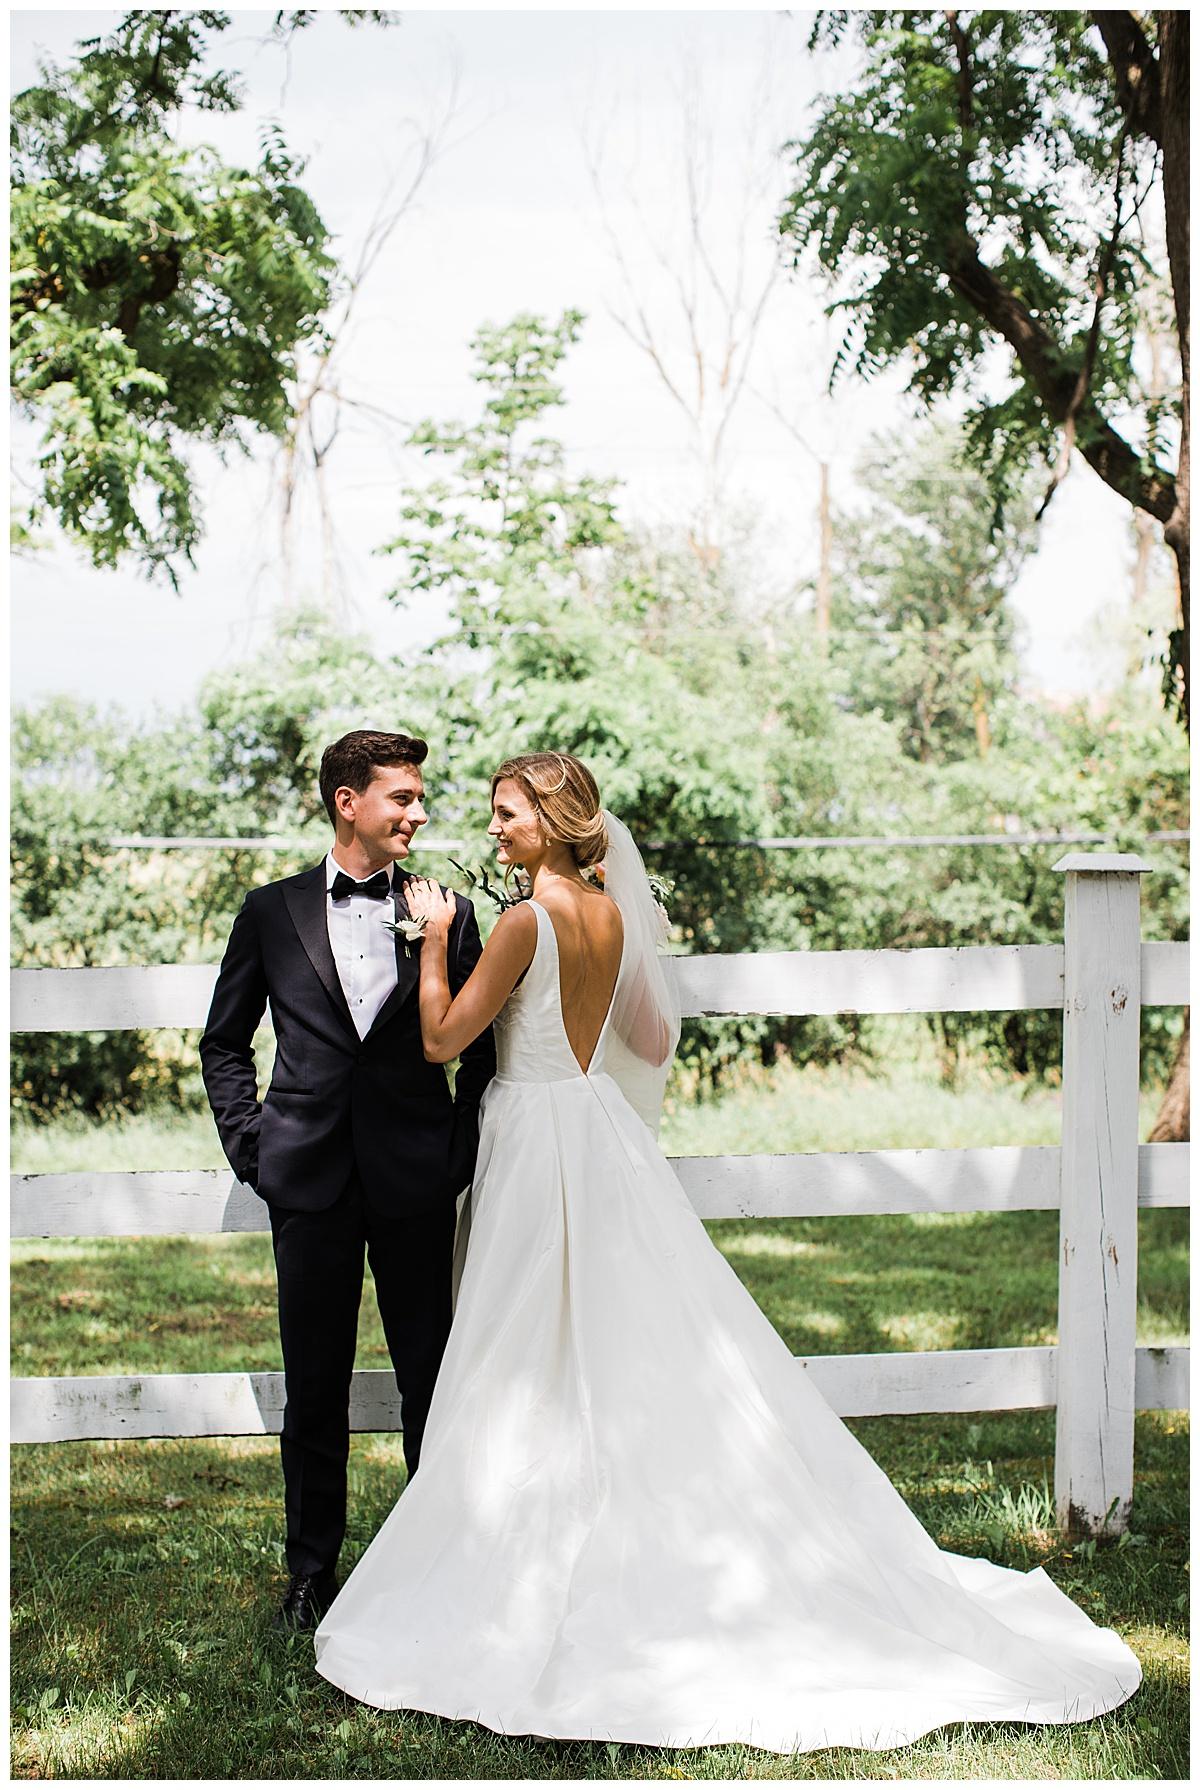 Bride and groom portrait with bride's train running behind her  Ontario wedding  Toronto wedding photographer  3photography